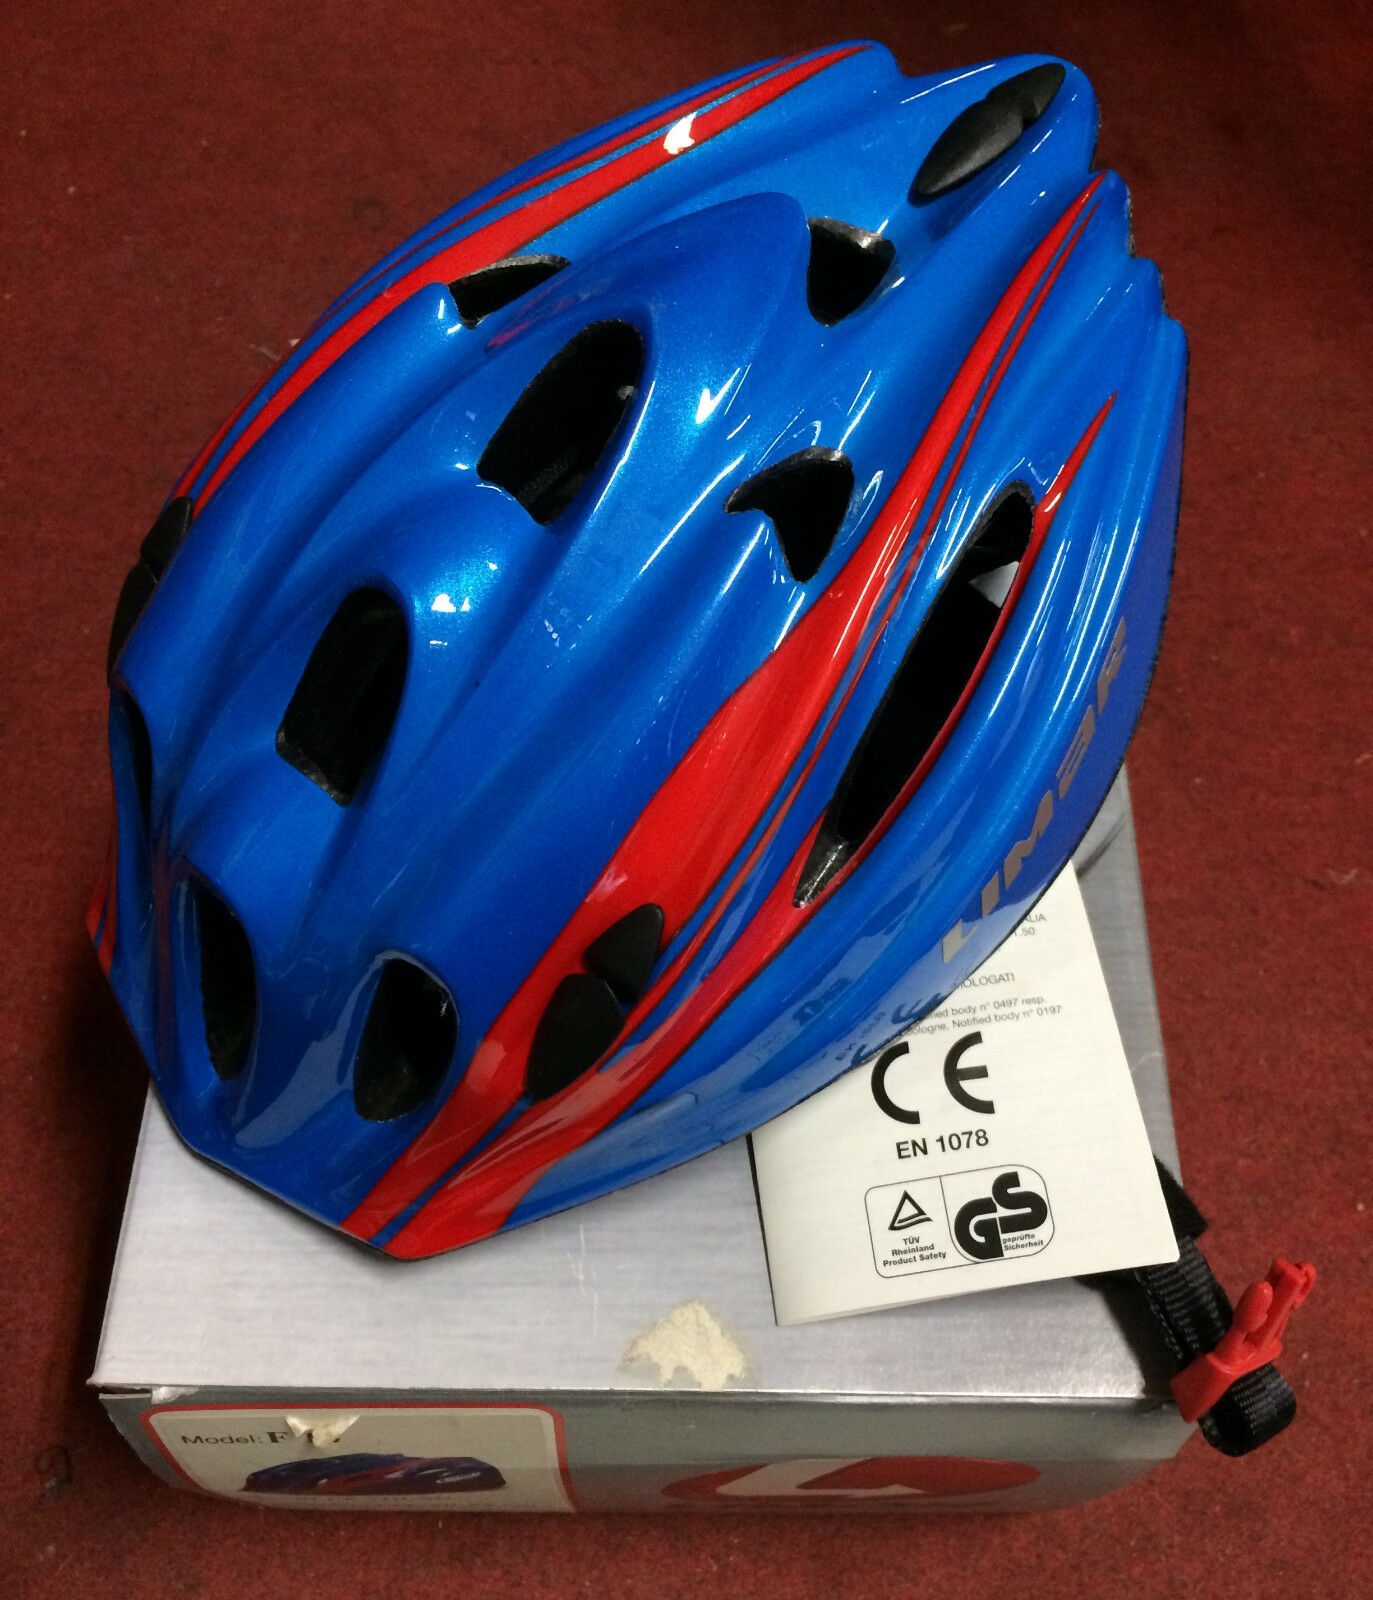 Casco bici corsa Limar F14 road bike helmet Unisize 50-55 cm bluee young